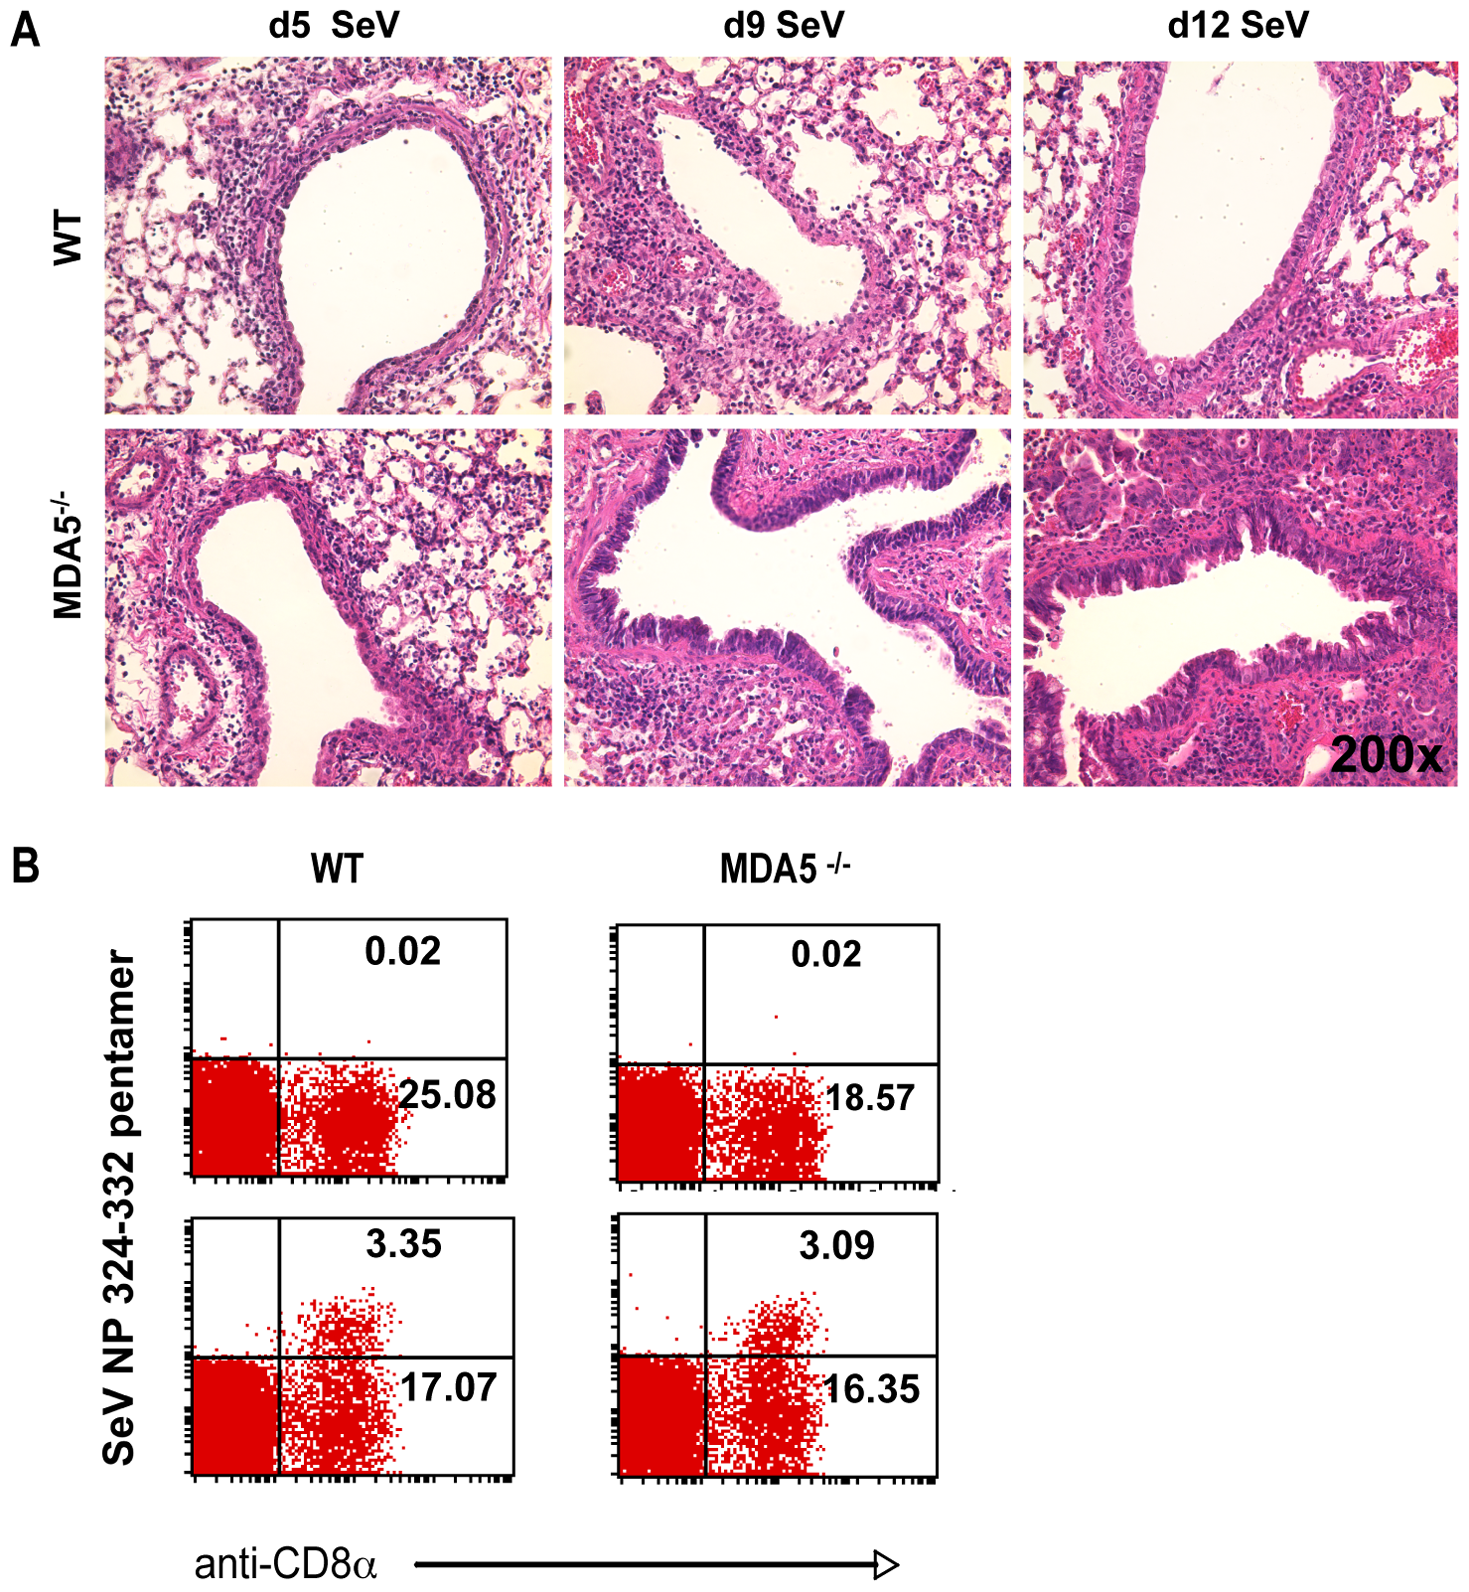 Increased histopathology in MDA5<sup>−/−</sup> mice.